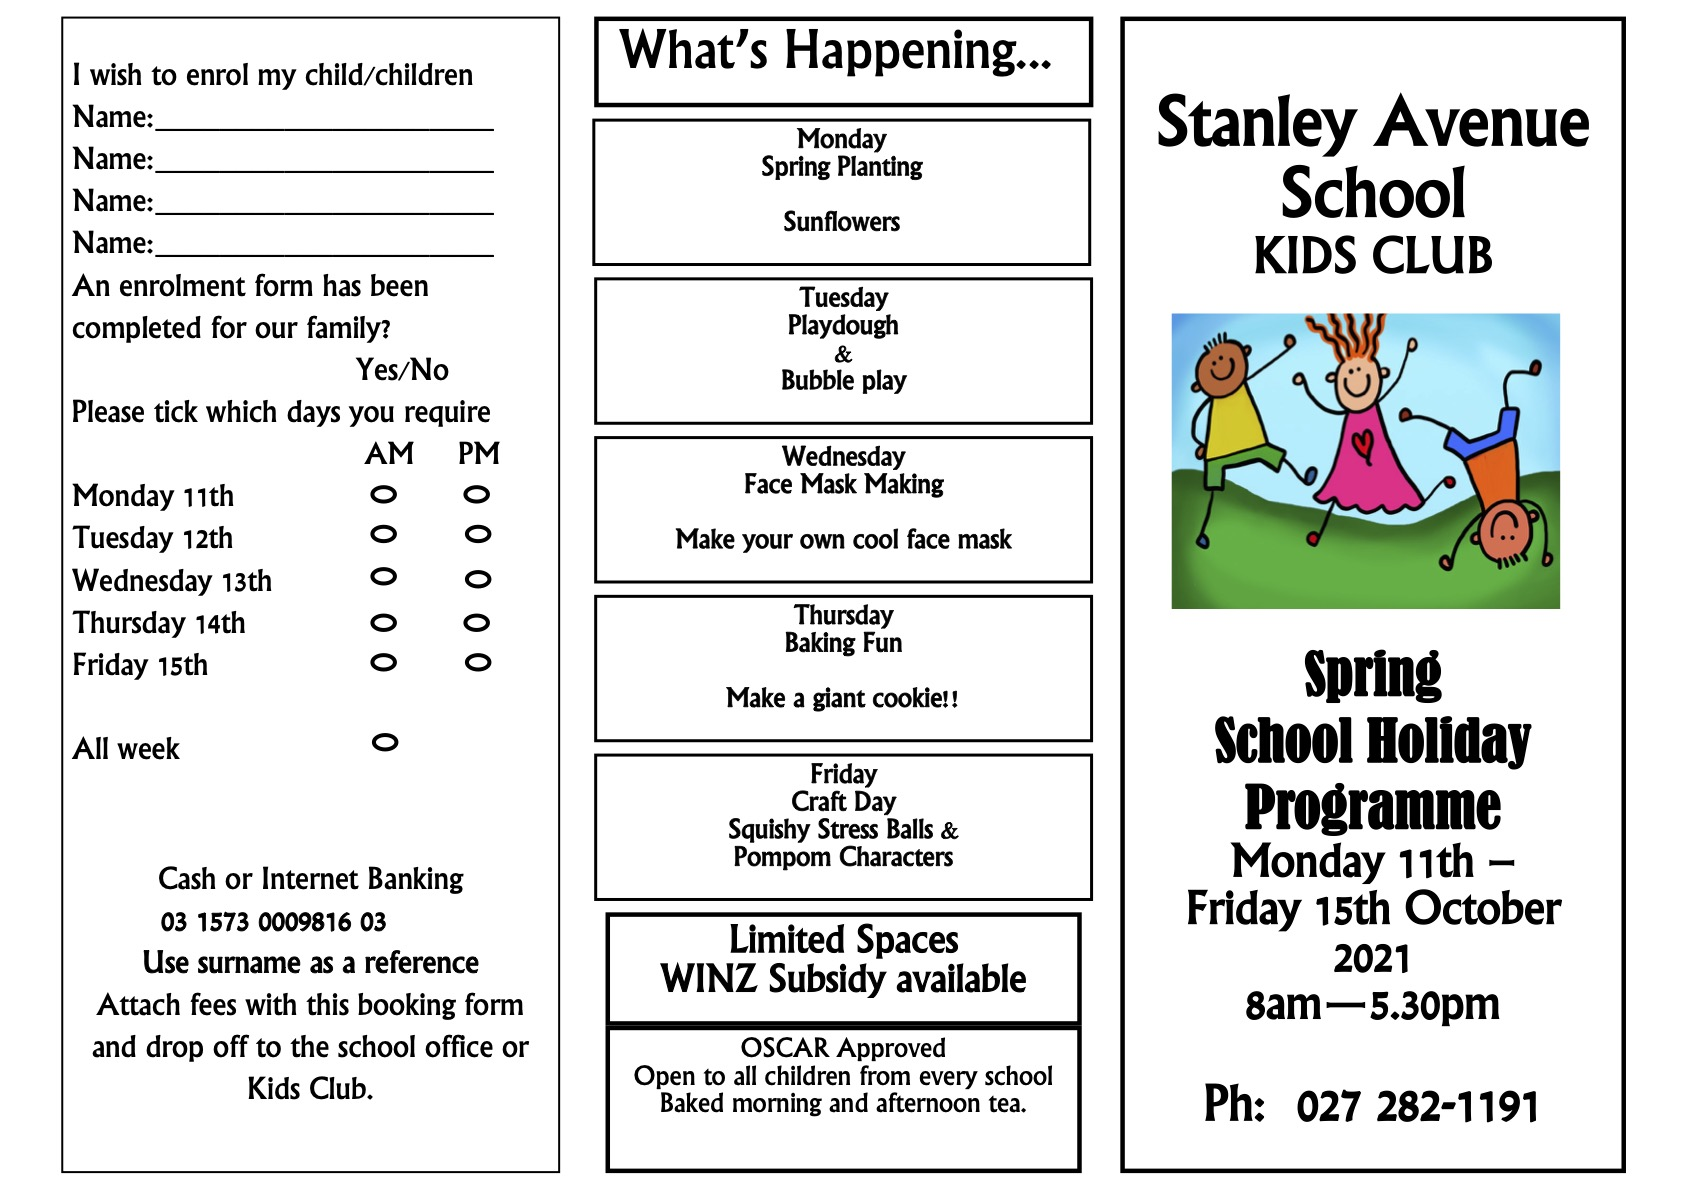 Our School, Stanley Avenue School